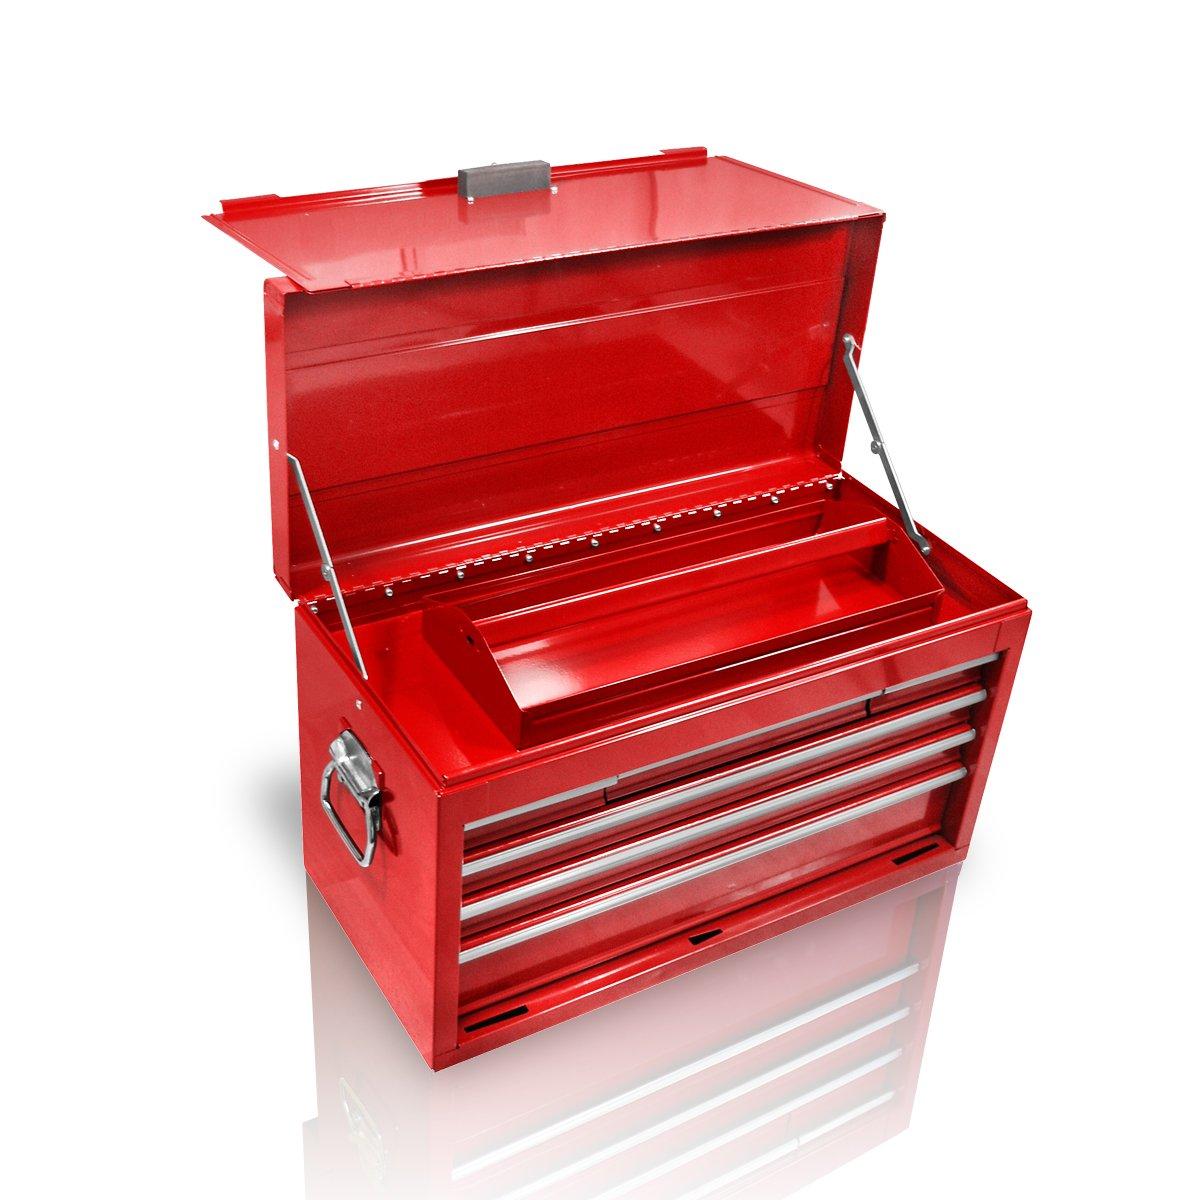 Holzinger Metall Werkzeugkoffer HWZK600-6, 6 Schubladen + 1 Fach, kugelgelagert